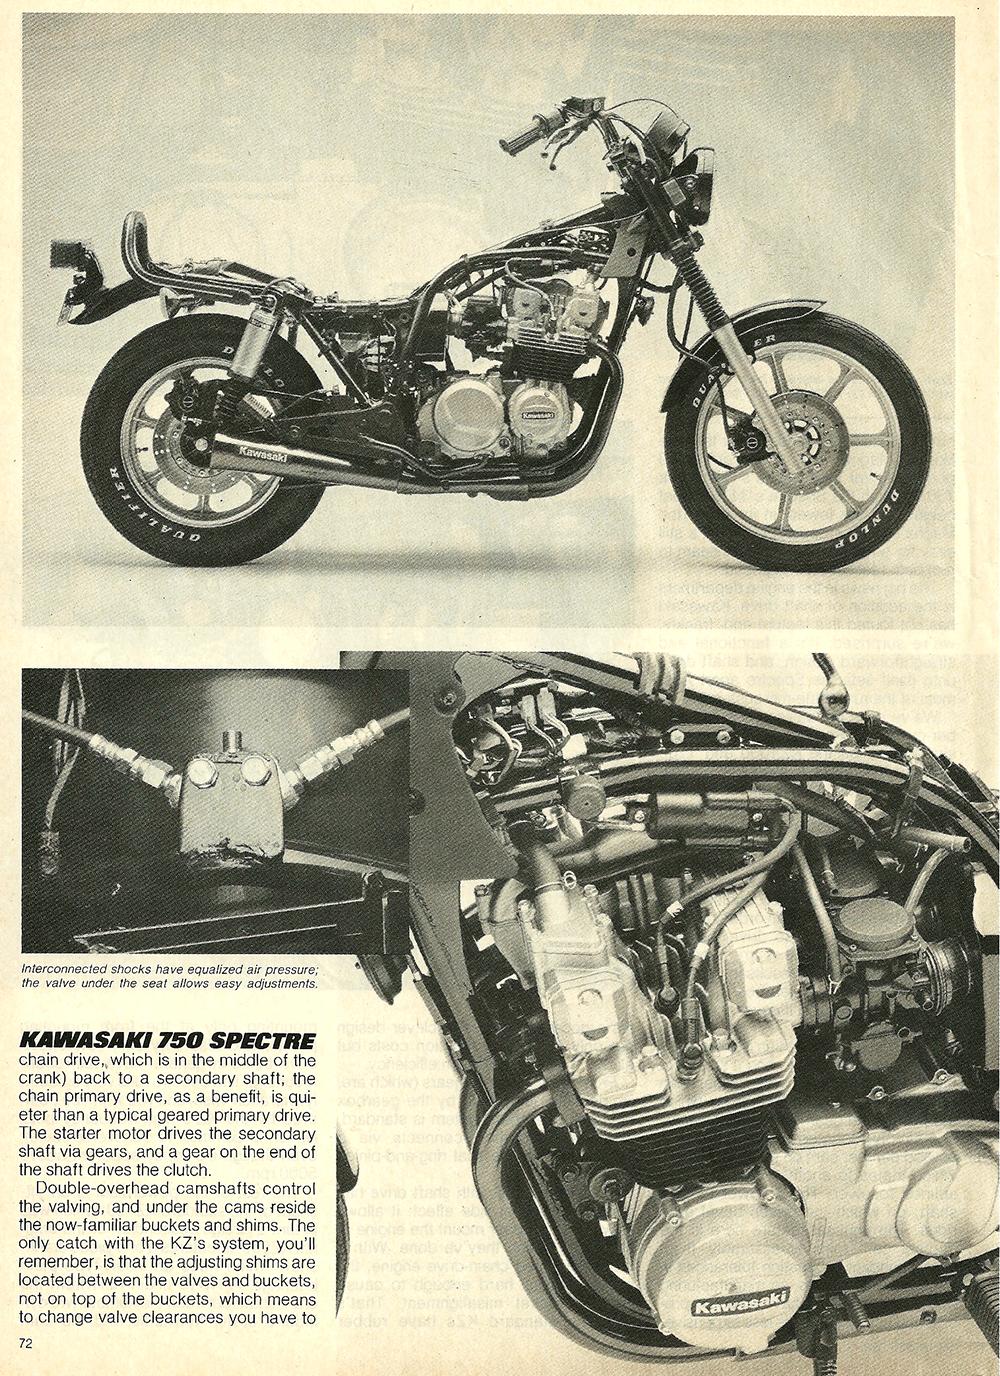 1982 Kawasaki KZ750N Spectre road test 5.jpg